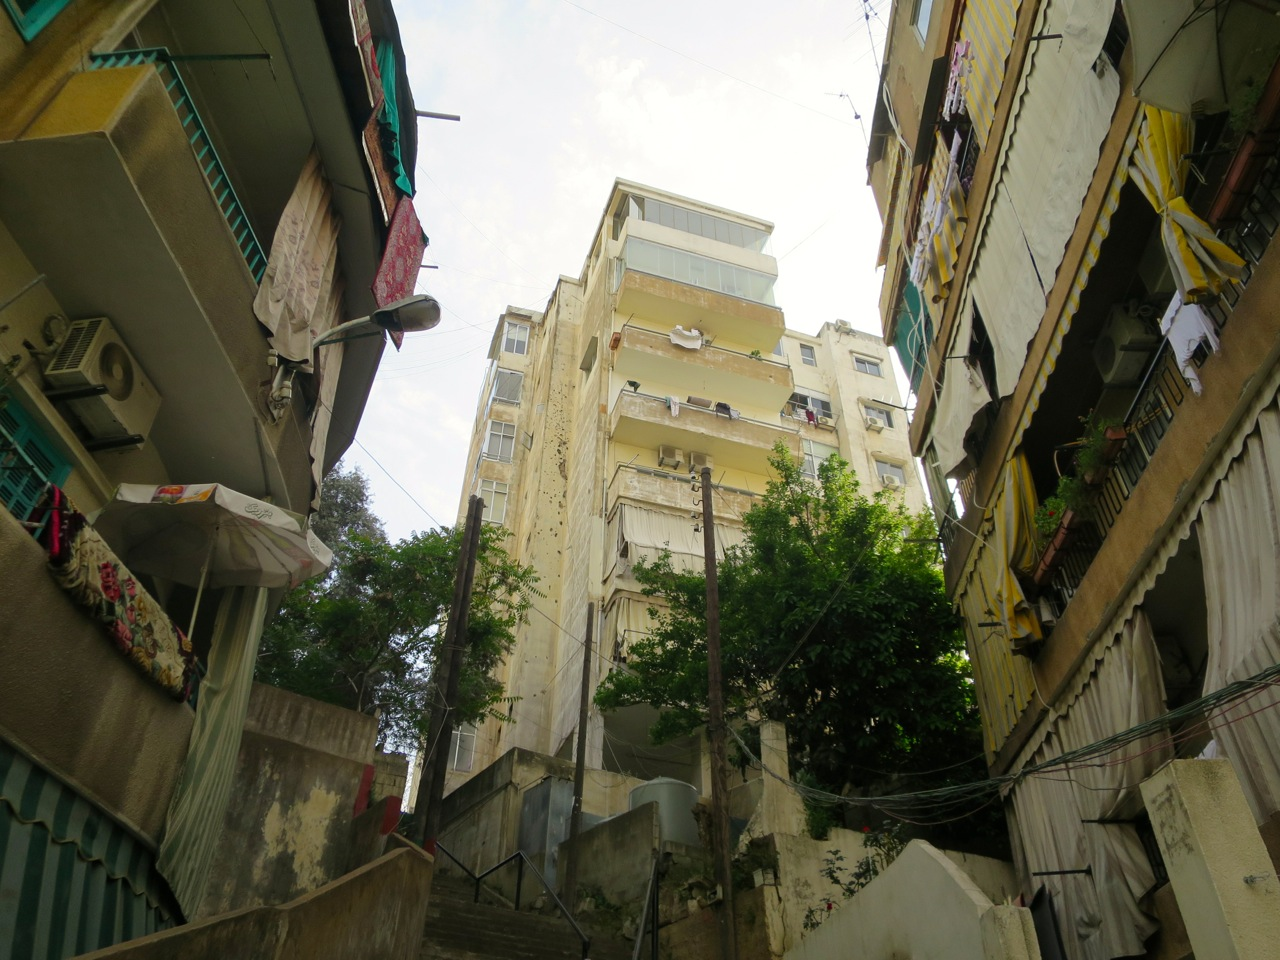 Beirute 2-16